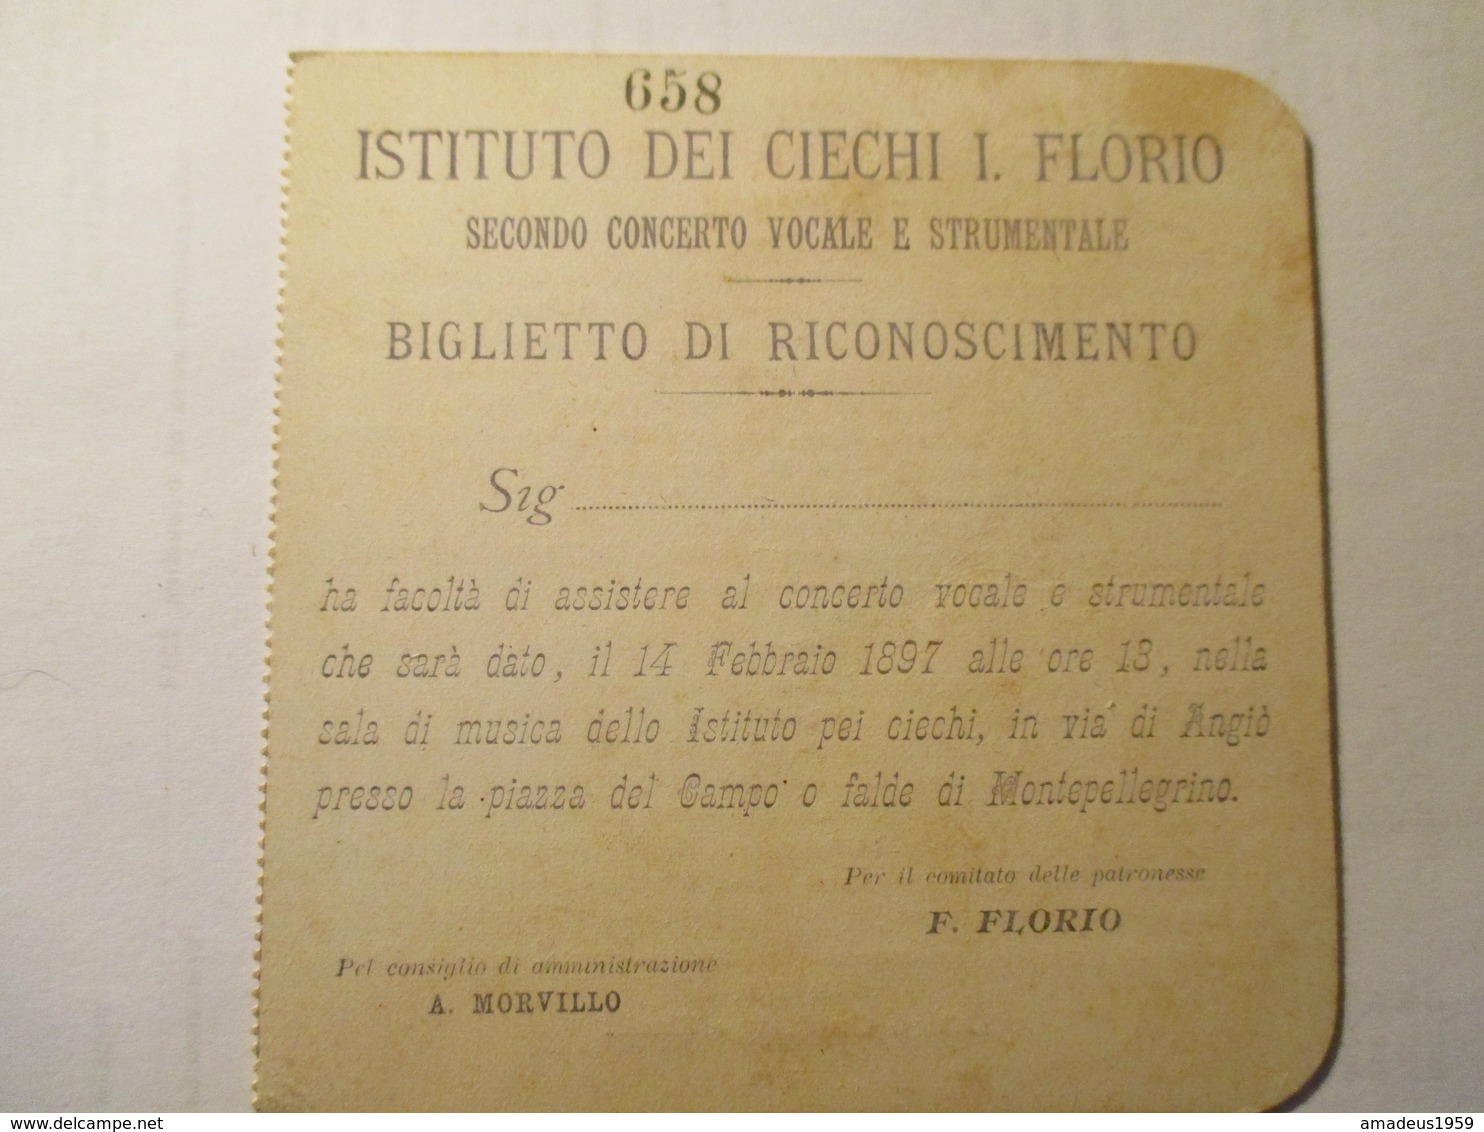 Biglietto Istituto Ciechi Florio 1897 - Tickets - Vouchers